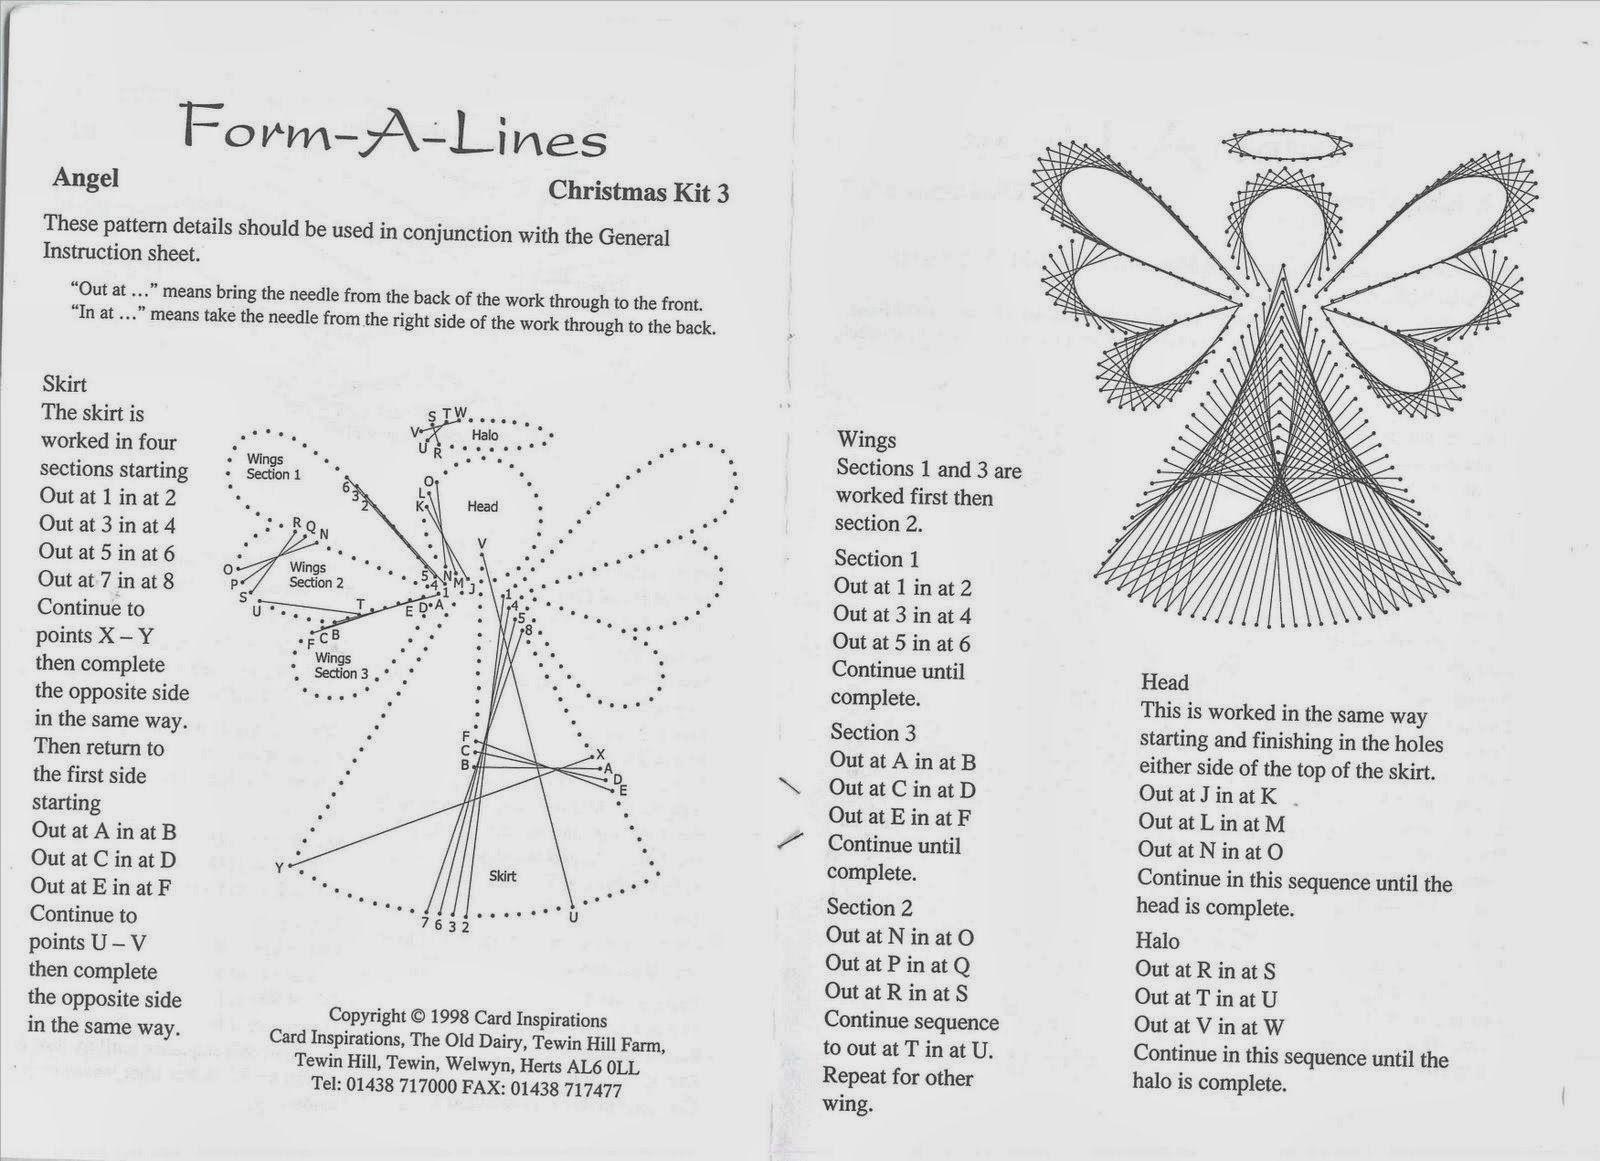 haft matematyczny wzory - Busca de Google | String art | Pinterest ...